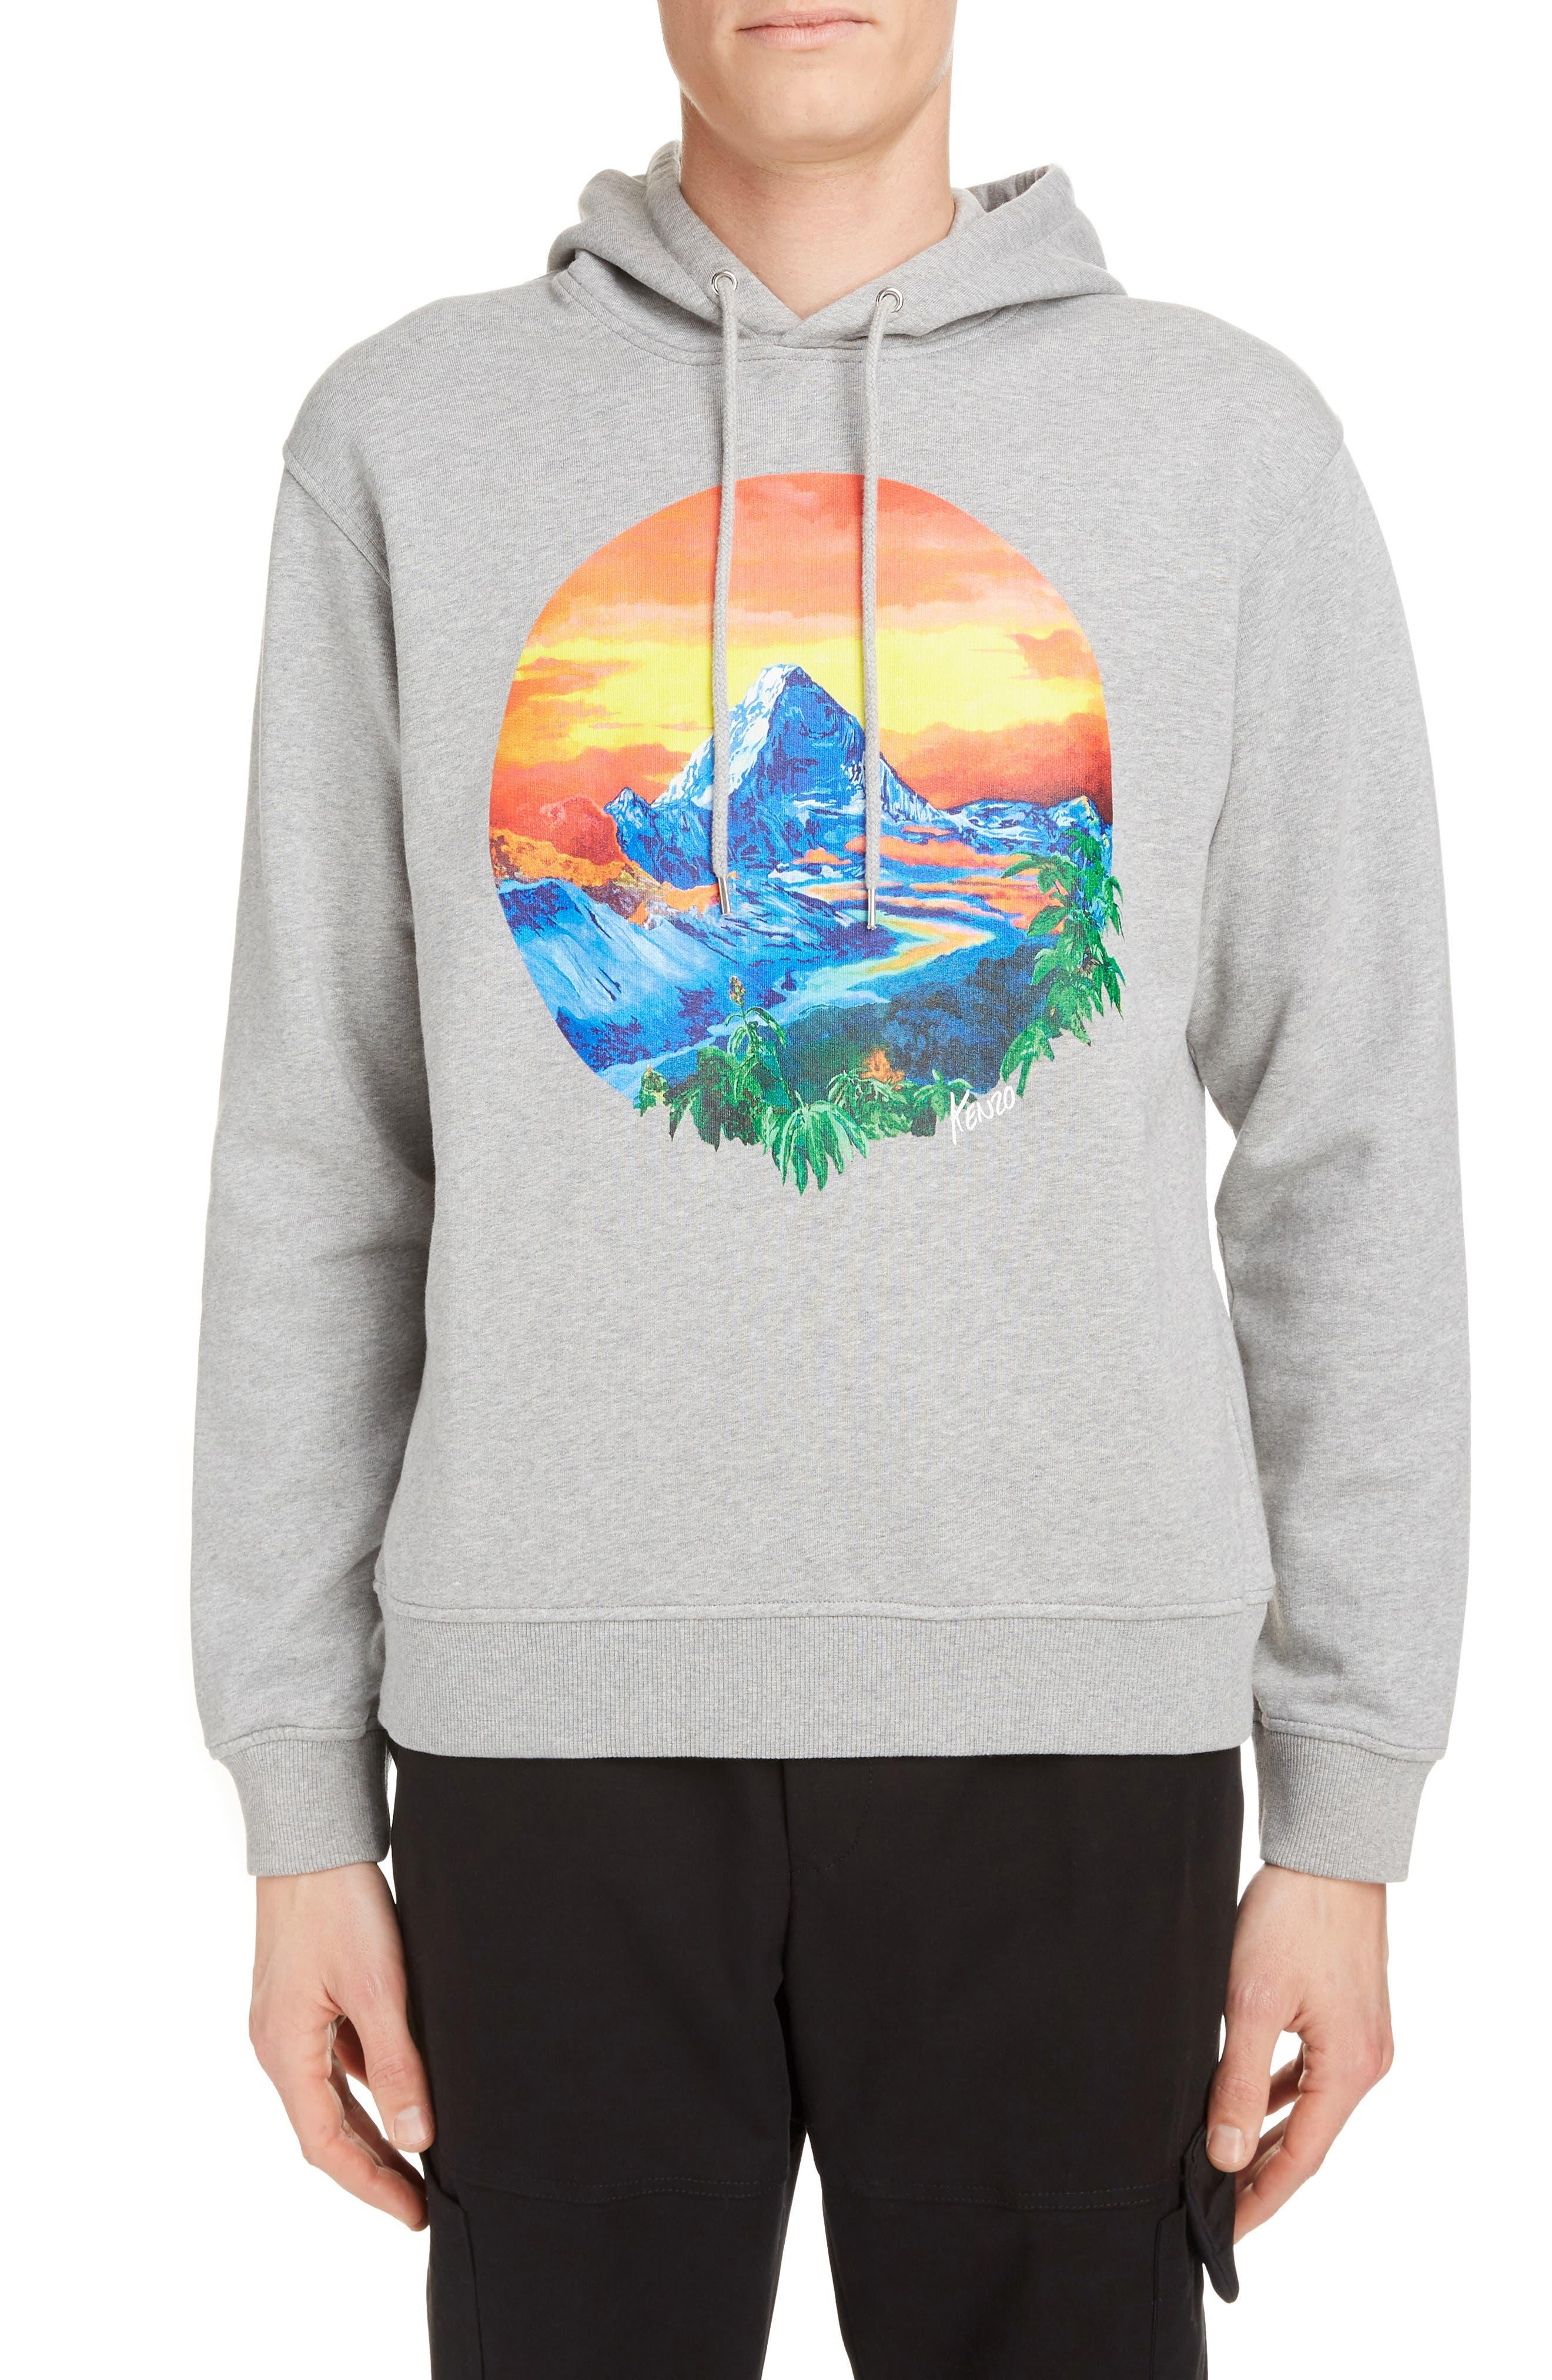 Kenzo Tops Mountain Graphic Cotton Hoodie